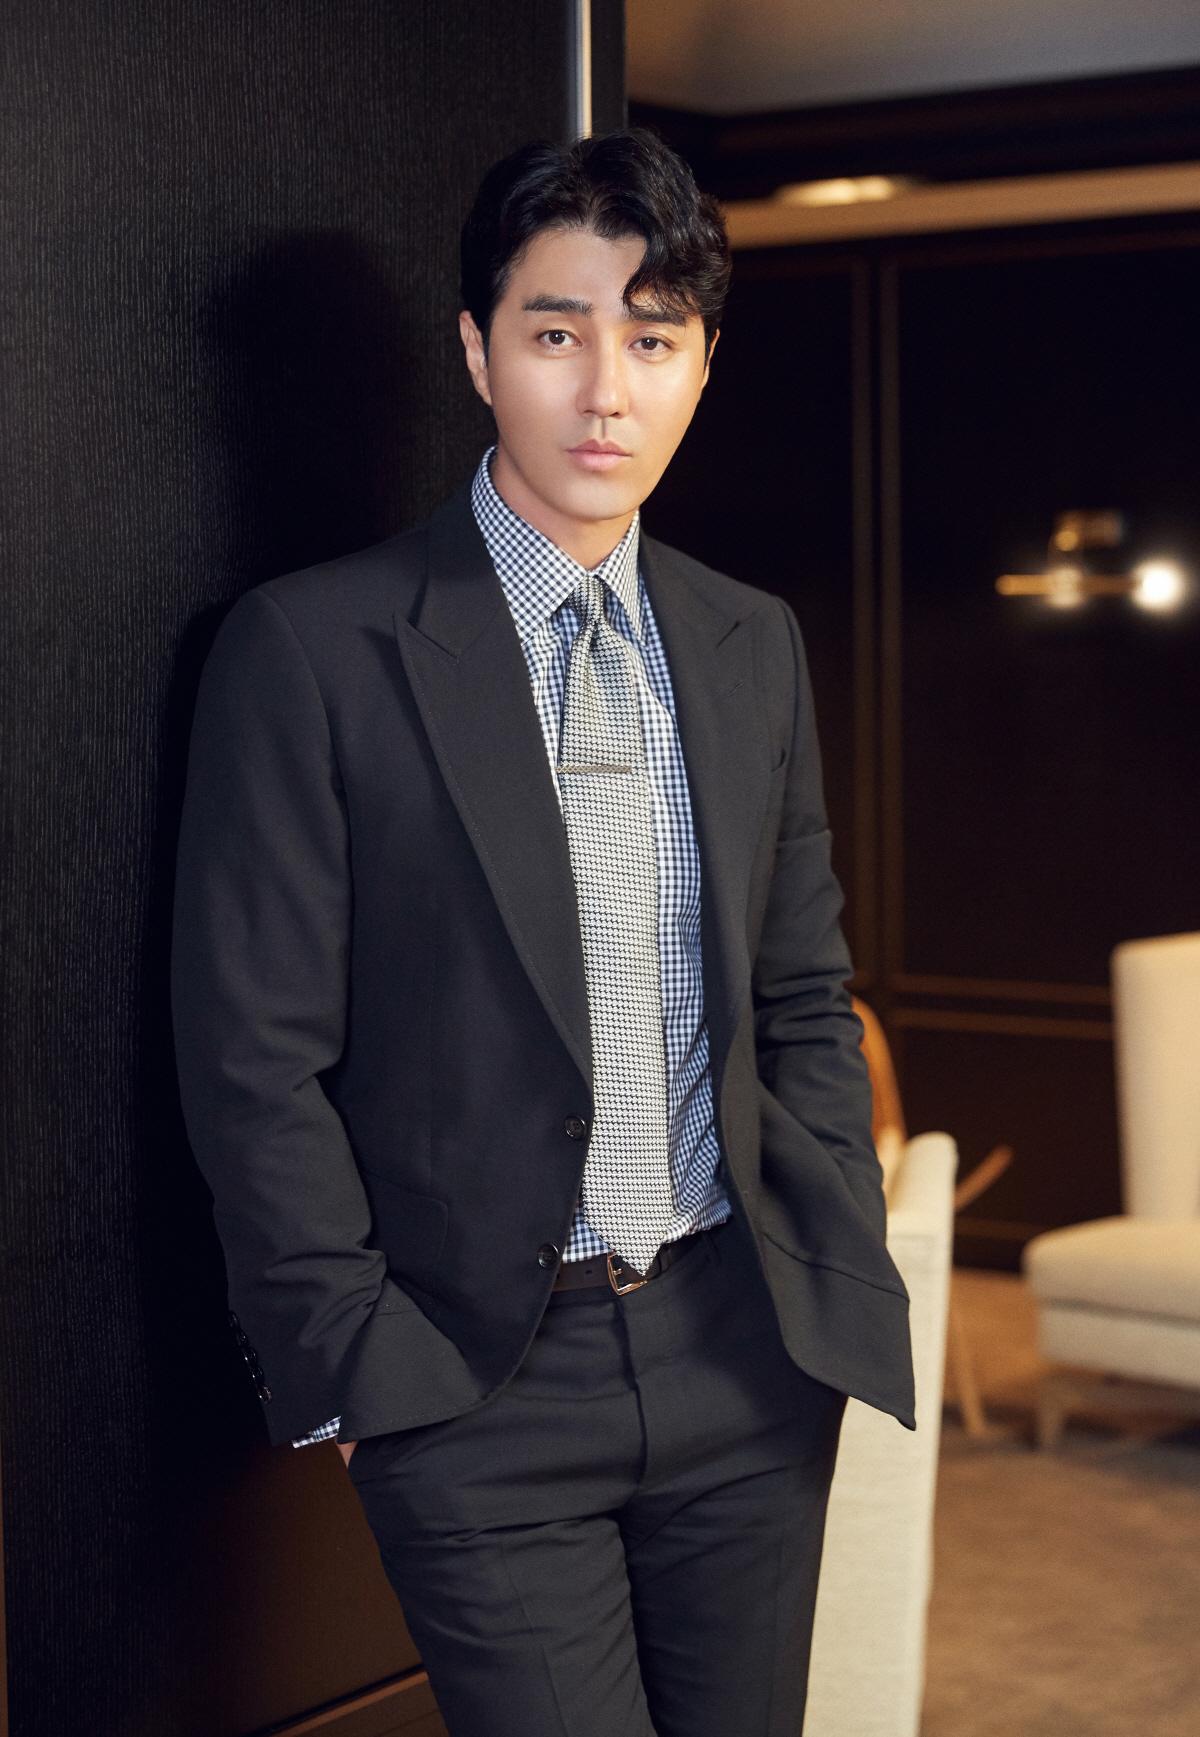 cha-seung-won-confirms-to-join-kim-soo-hyun-in-new-drama-that-night